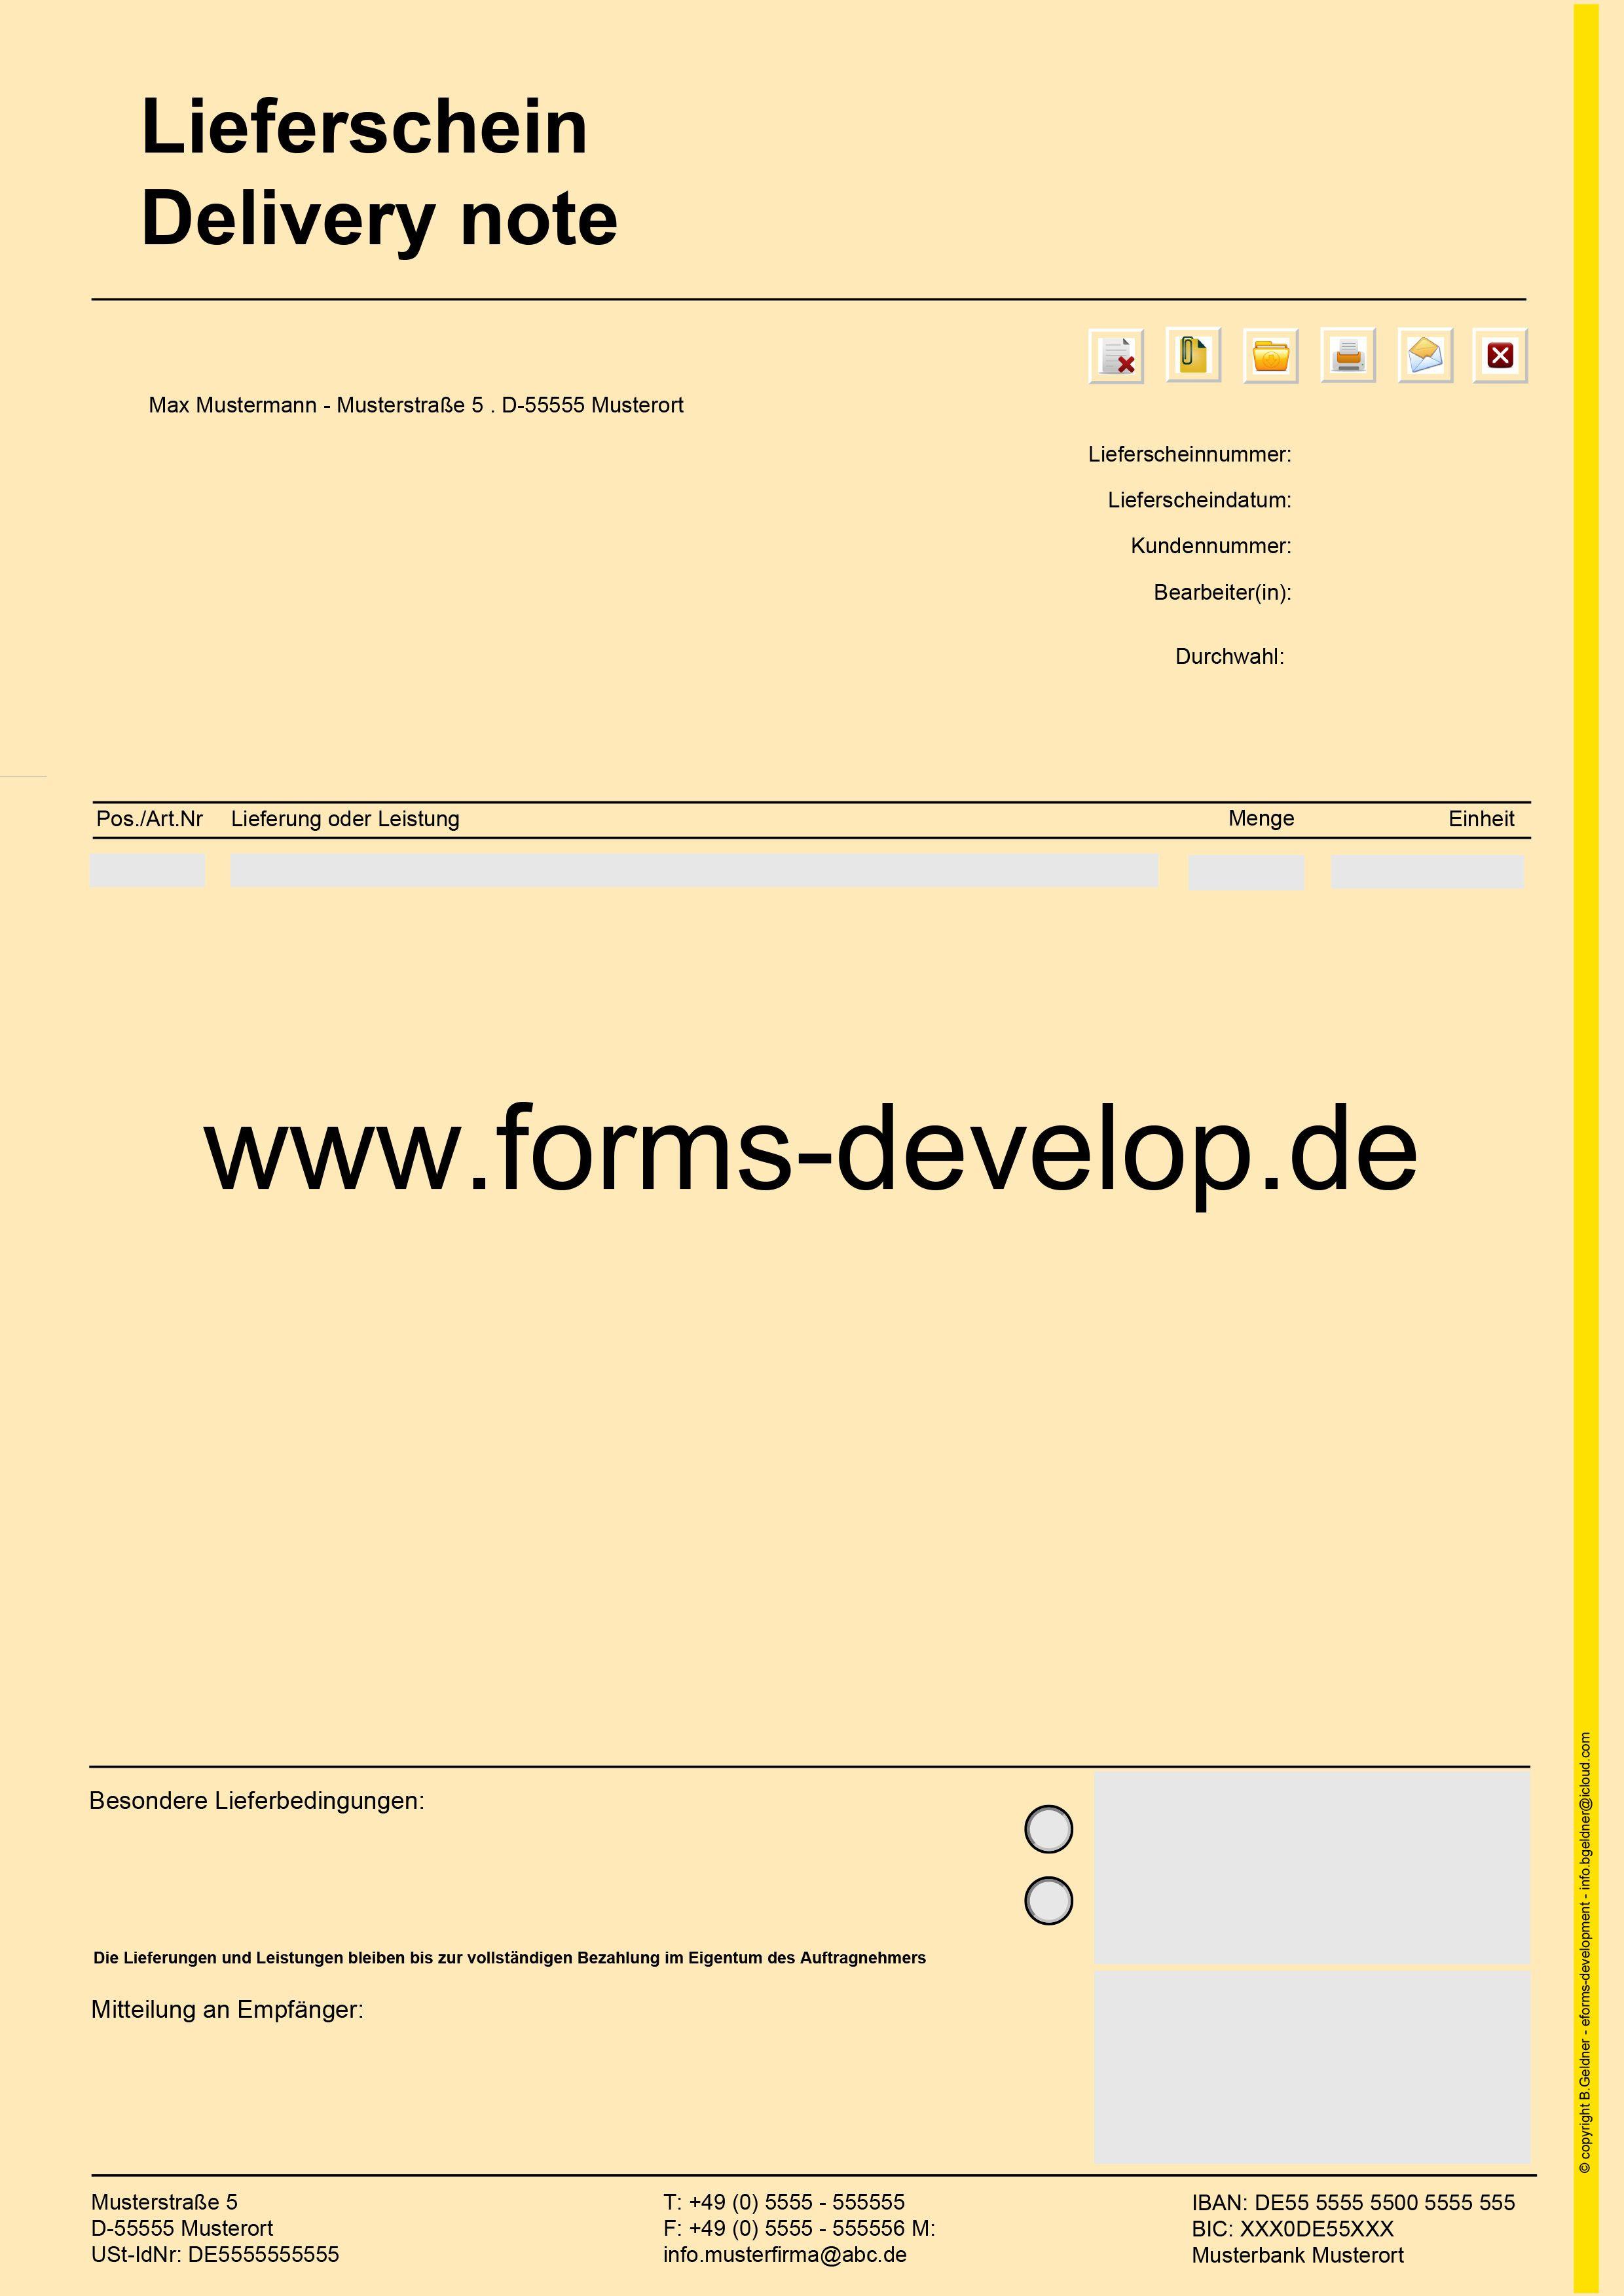 pdf formular lieferschein position lieferung oder. Black Bedroom Furniture Sets. Home Design Ideas